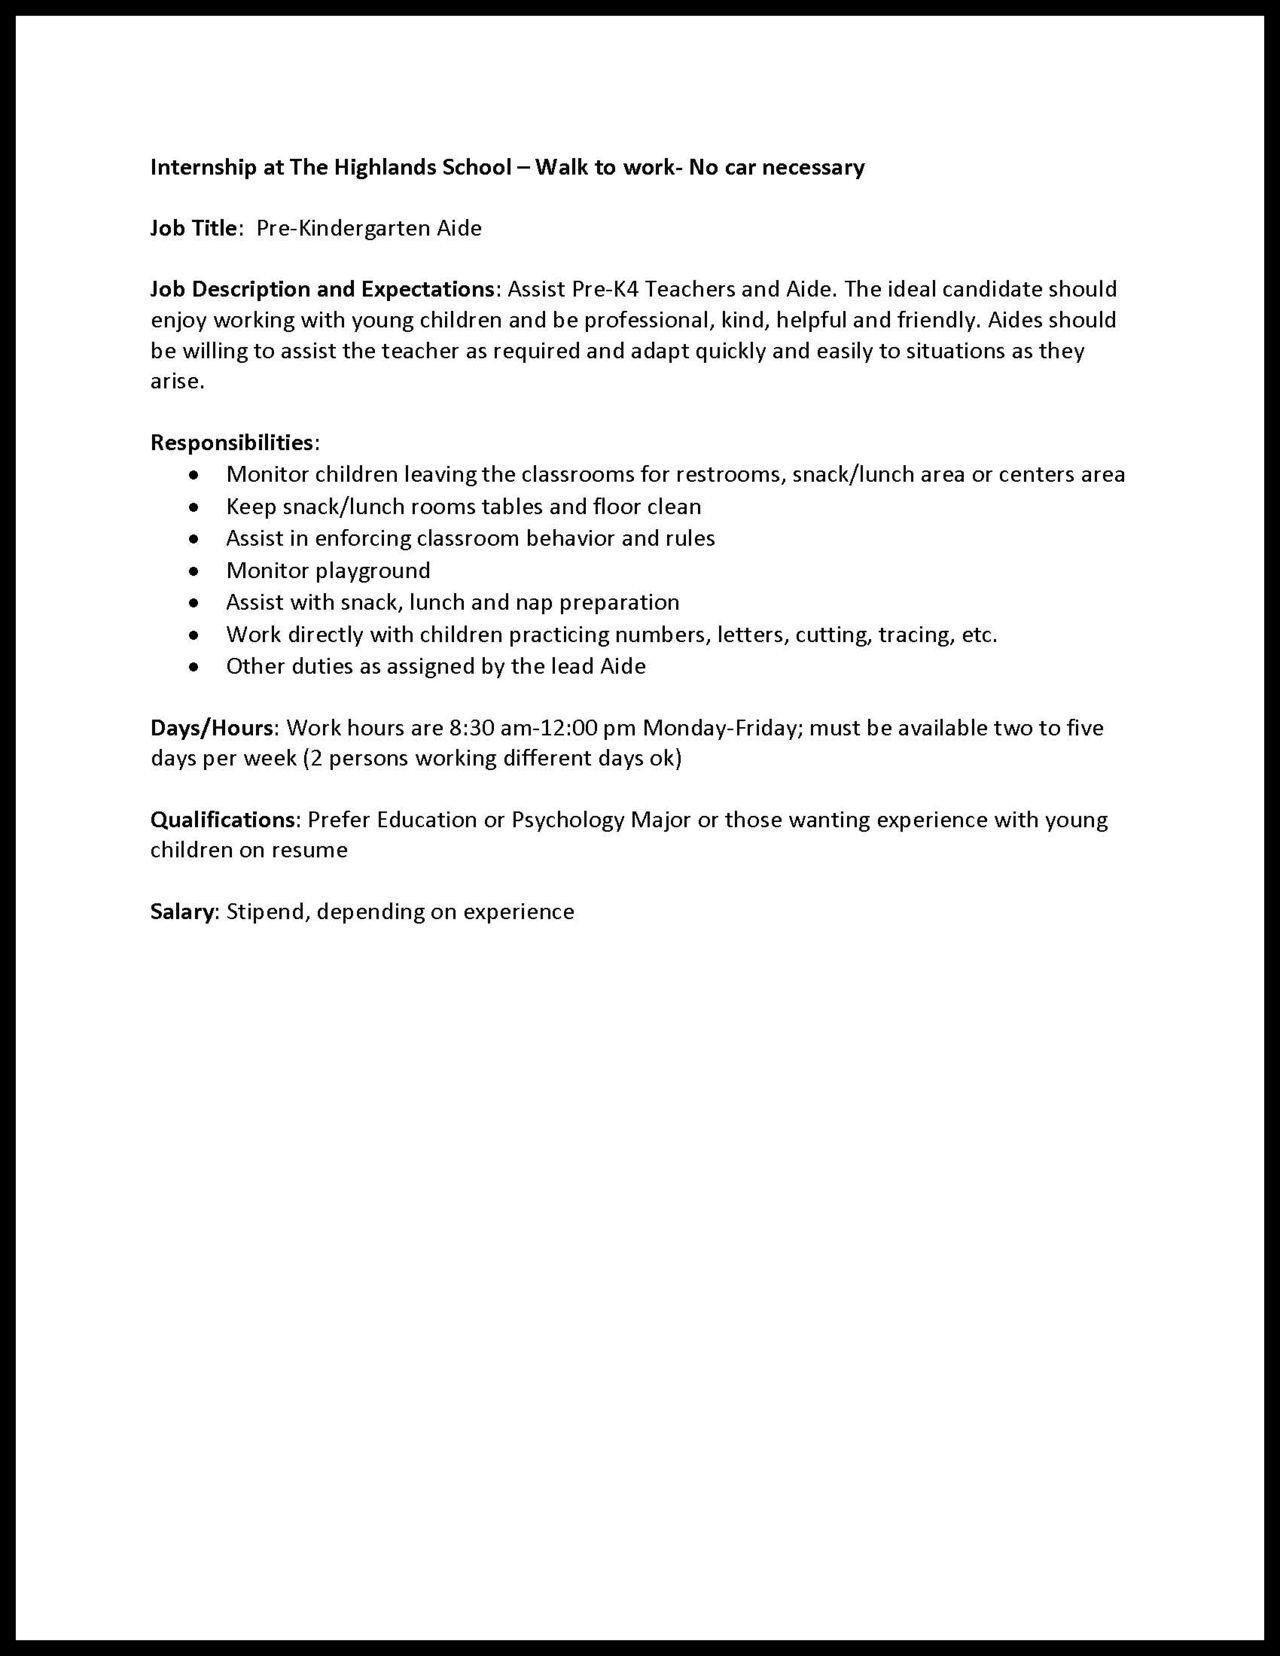 Udcs The Crimson Paper Fastener Uofdallas Internships Available At The Highlands Internship Career Development Job